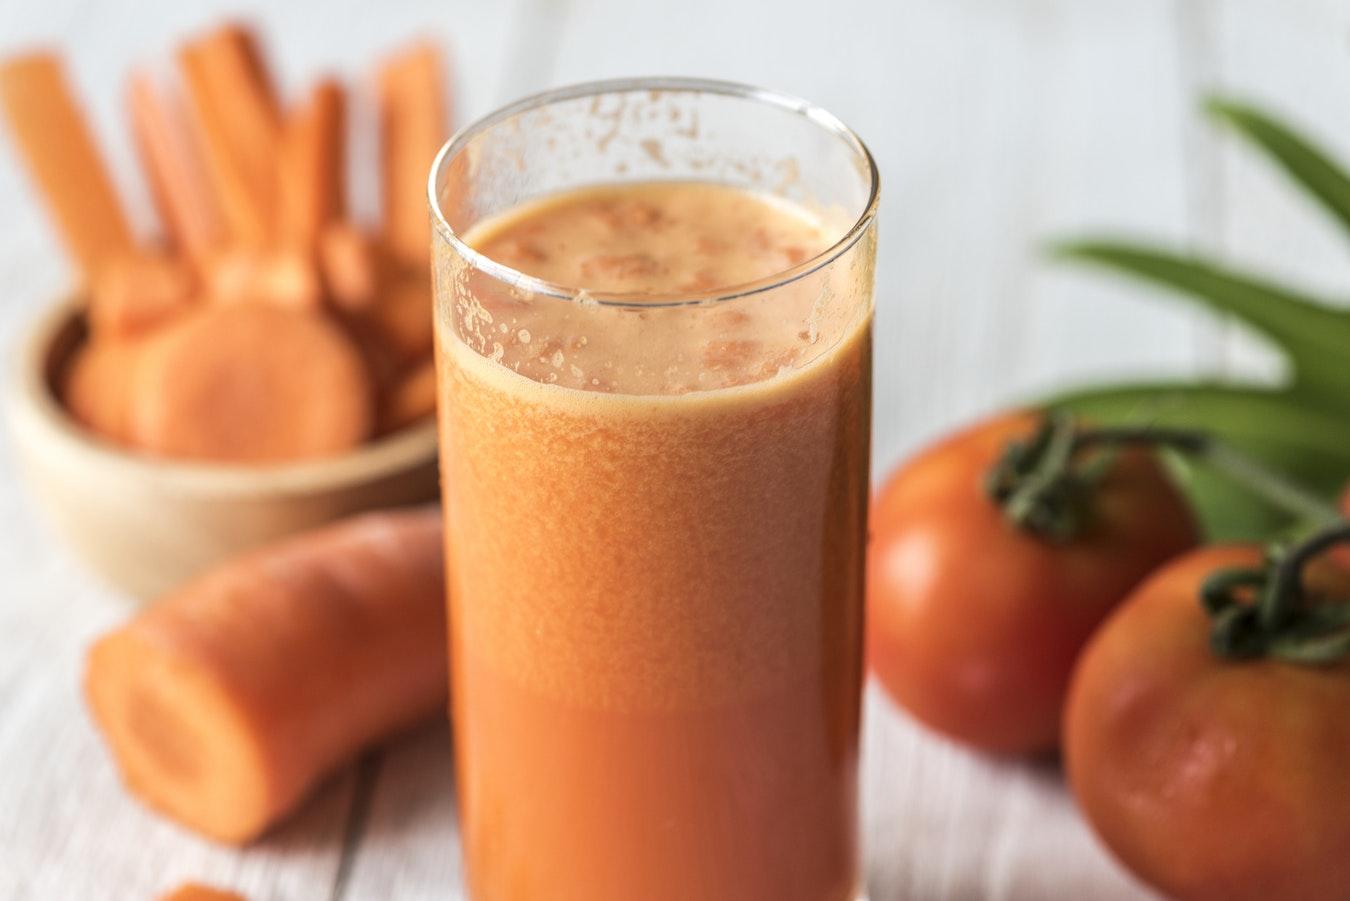 Dieta estiva, dimagrire con i succhi di verdura